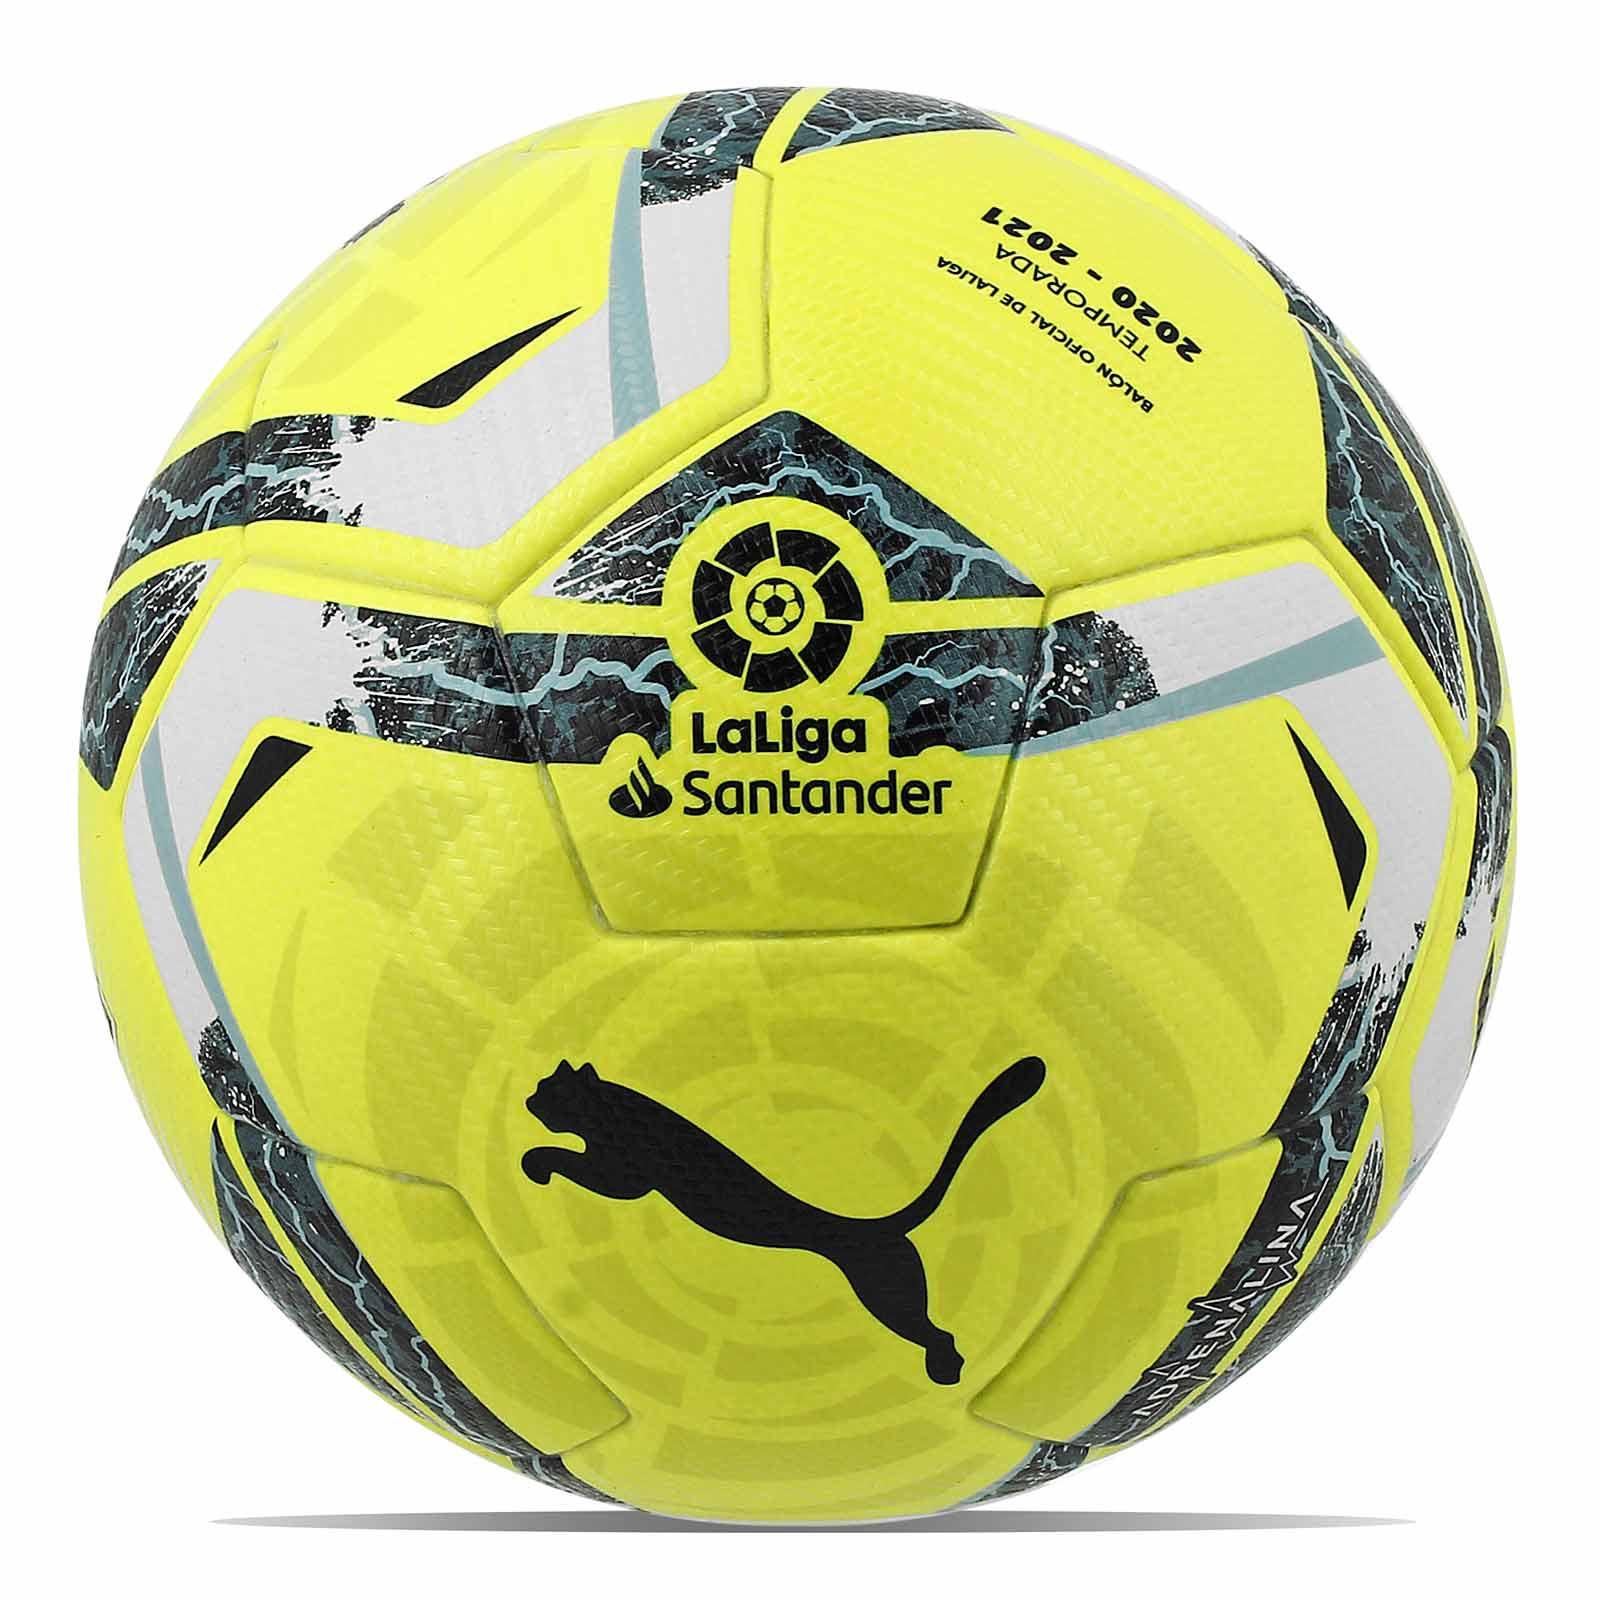 obra maestra Seguid así visión  Balón Puma La Liga 20 21 FIFA Pro talla 5 amarillo | futbolmania